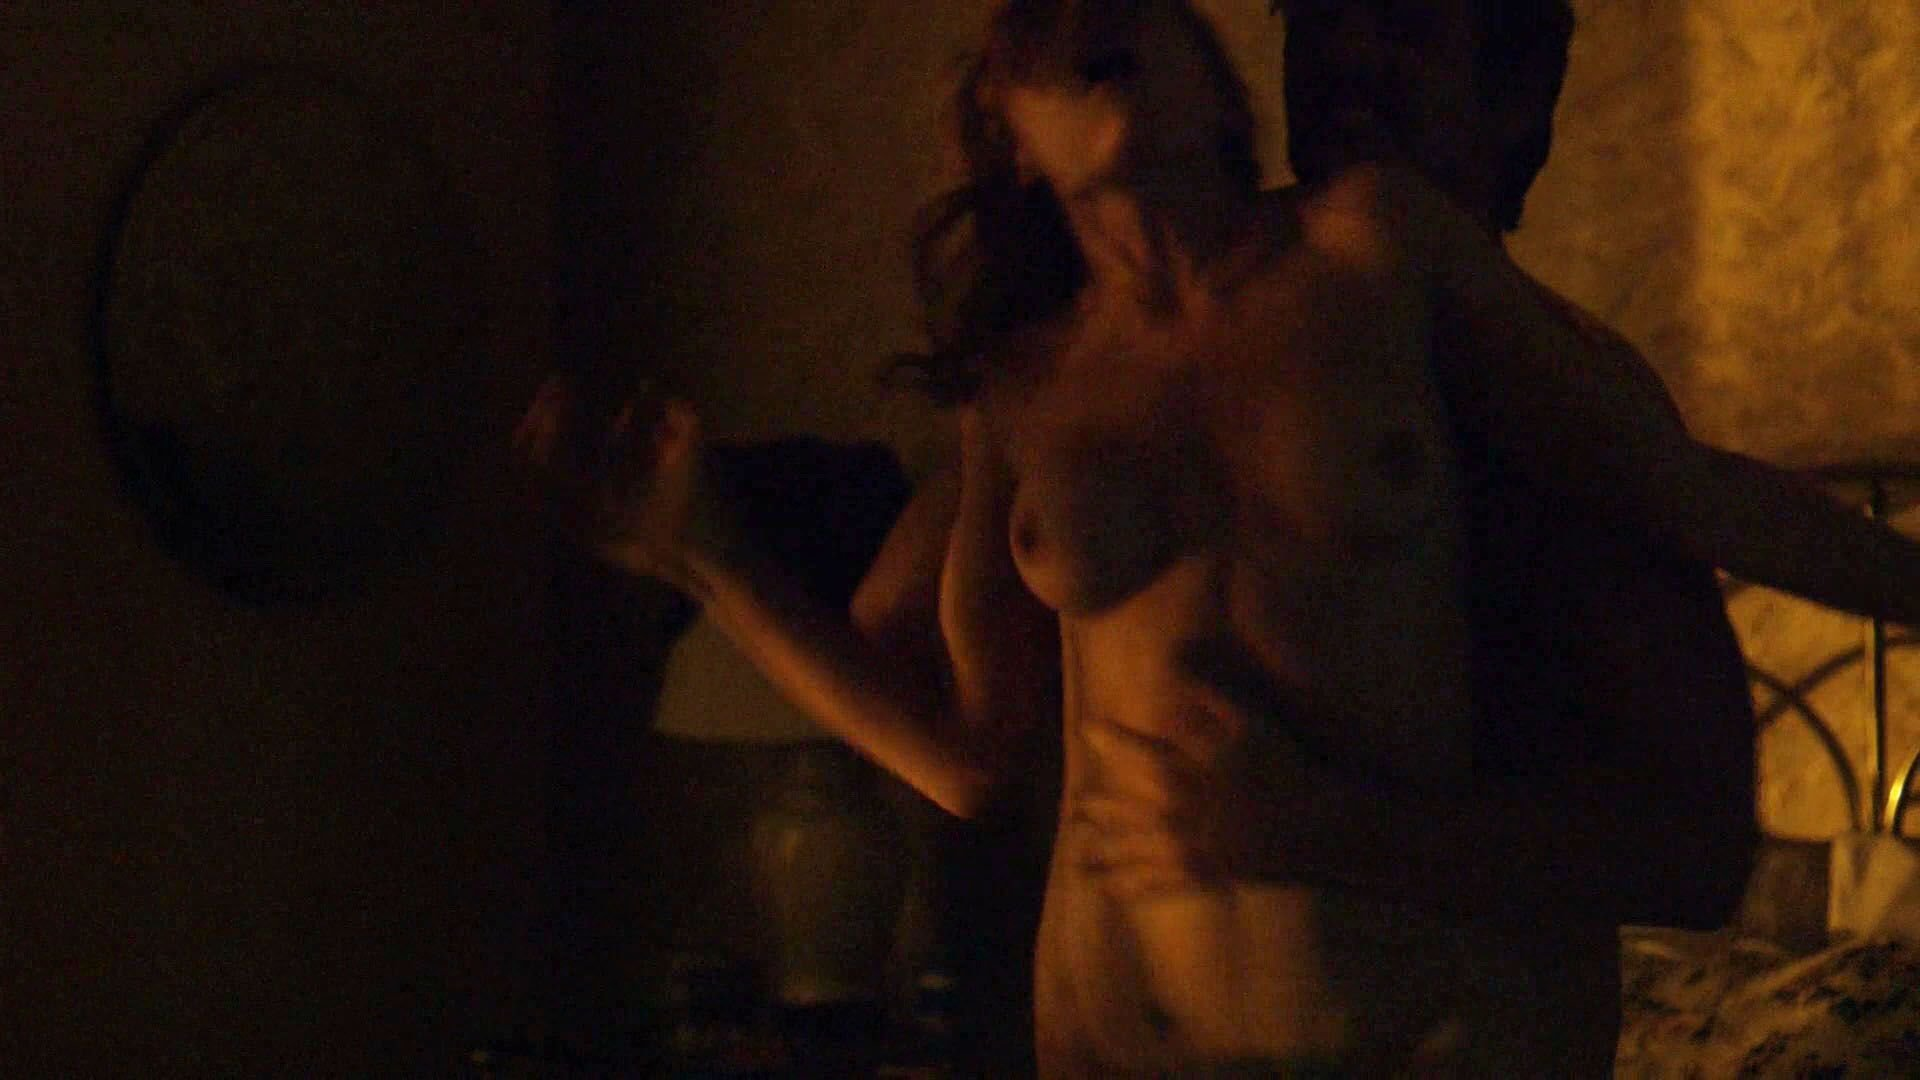 picture Carolina acevedo topless